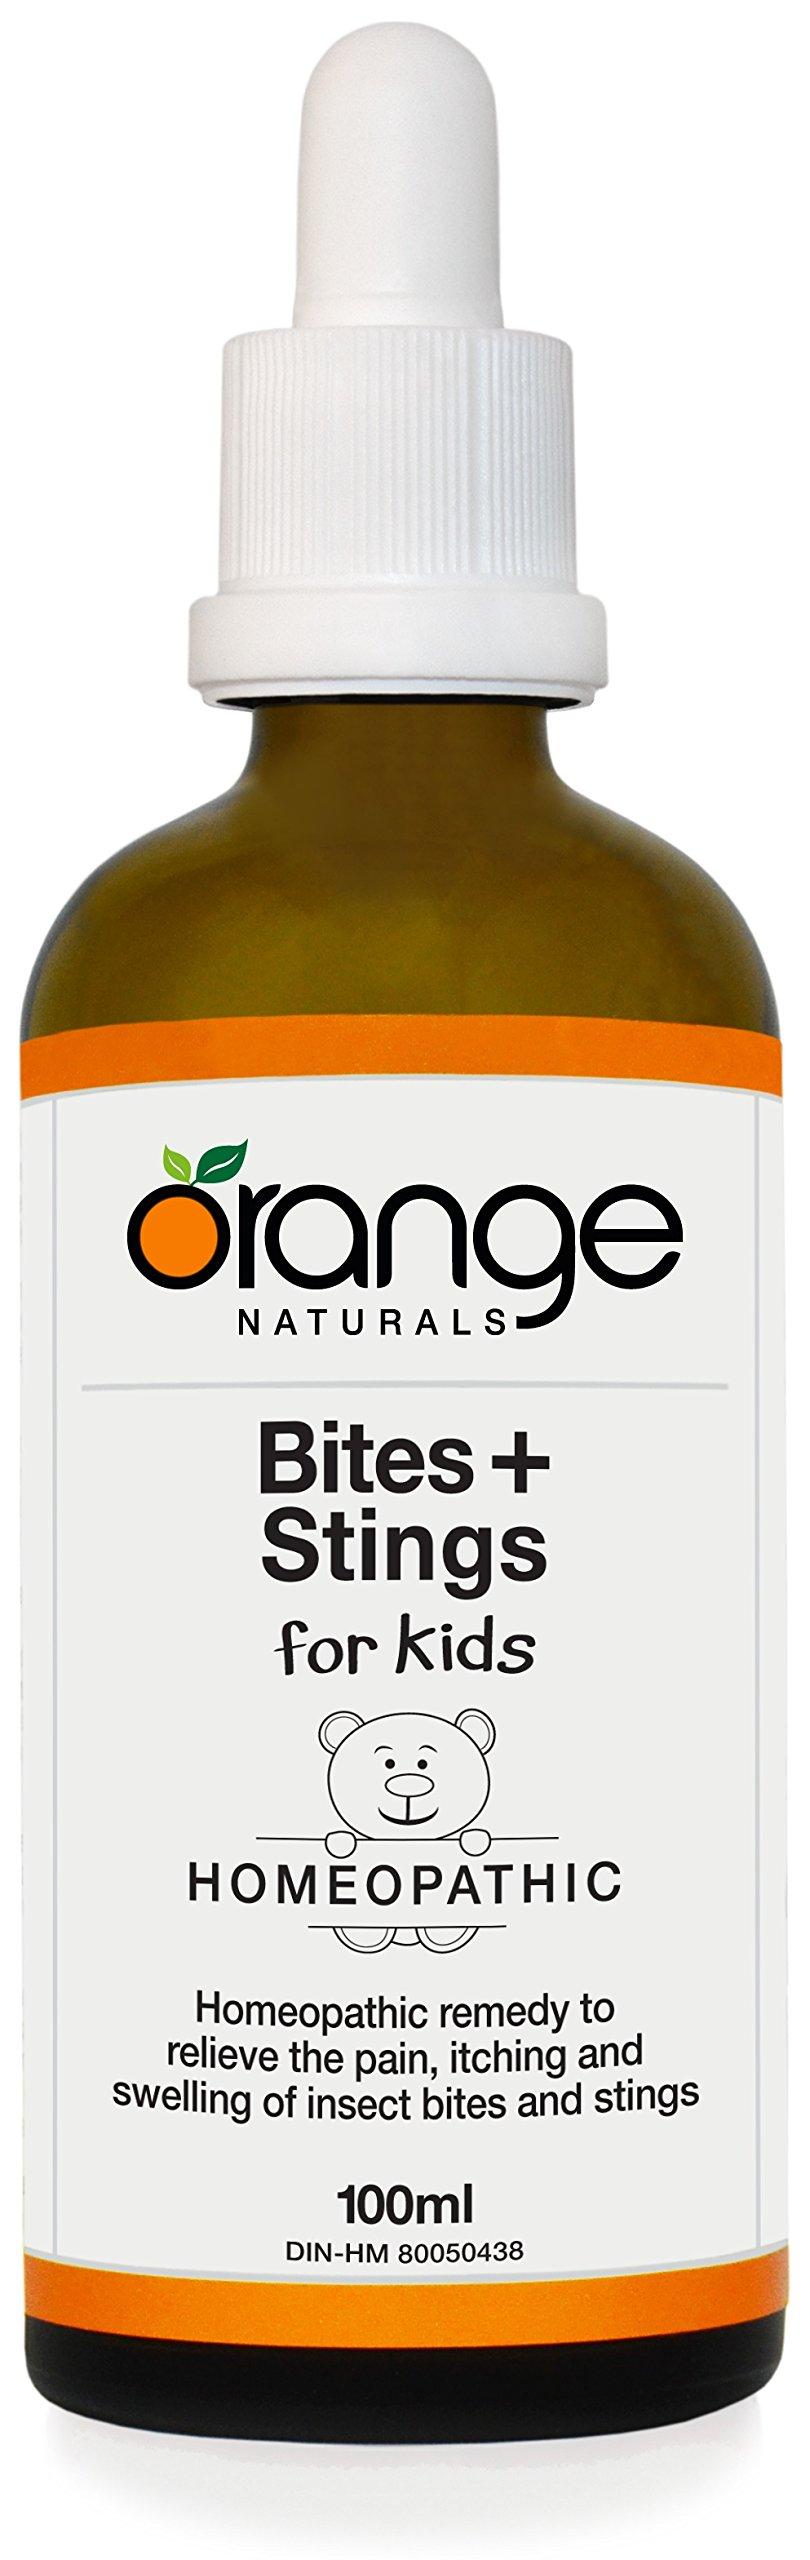 Orange Naturals Homeopathic Bites + Stings for Kids, 100 ml